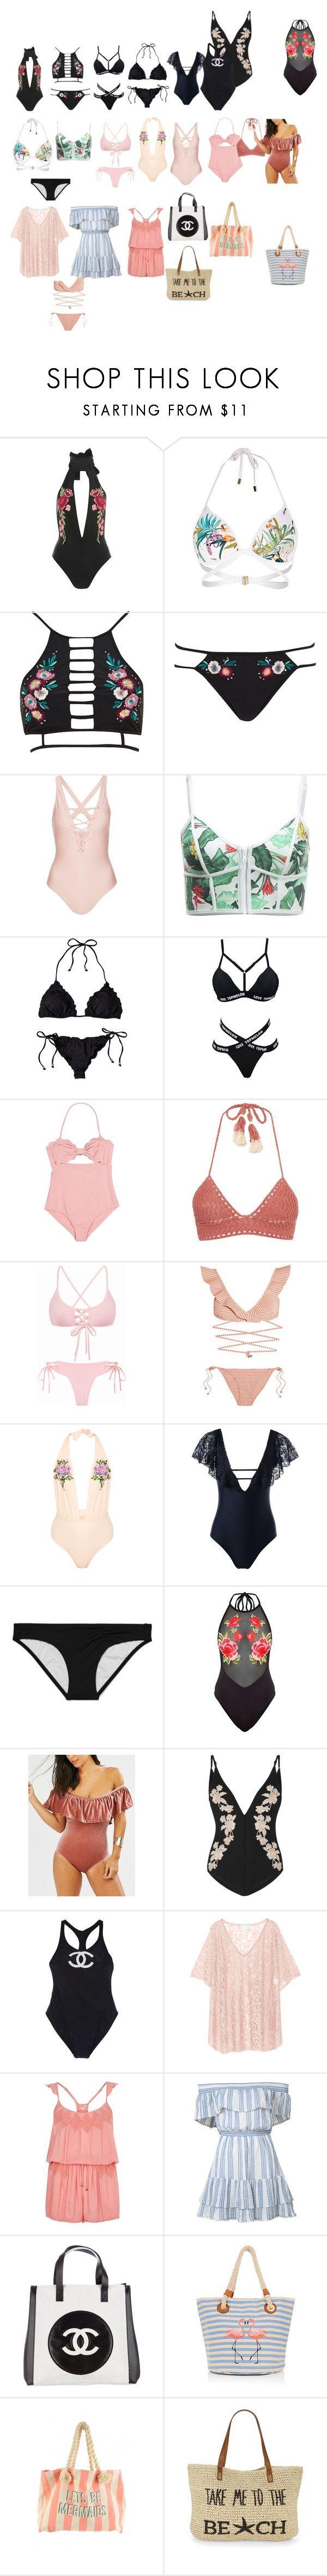 """gabi demartino inspired swimwear/beach essentials"" by novaturient98 ❤ liked on Polyvore featuring Rare London, River Island, Topshop, Duskii, SHE MADE ME, Zimmermann, Victoria's Secret, Chanel, Melissa Odabash and LoveShackFancy"